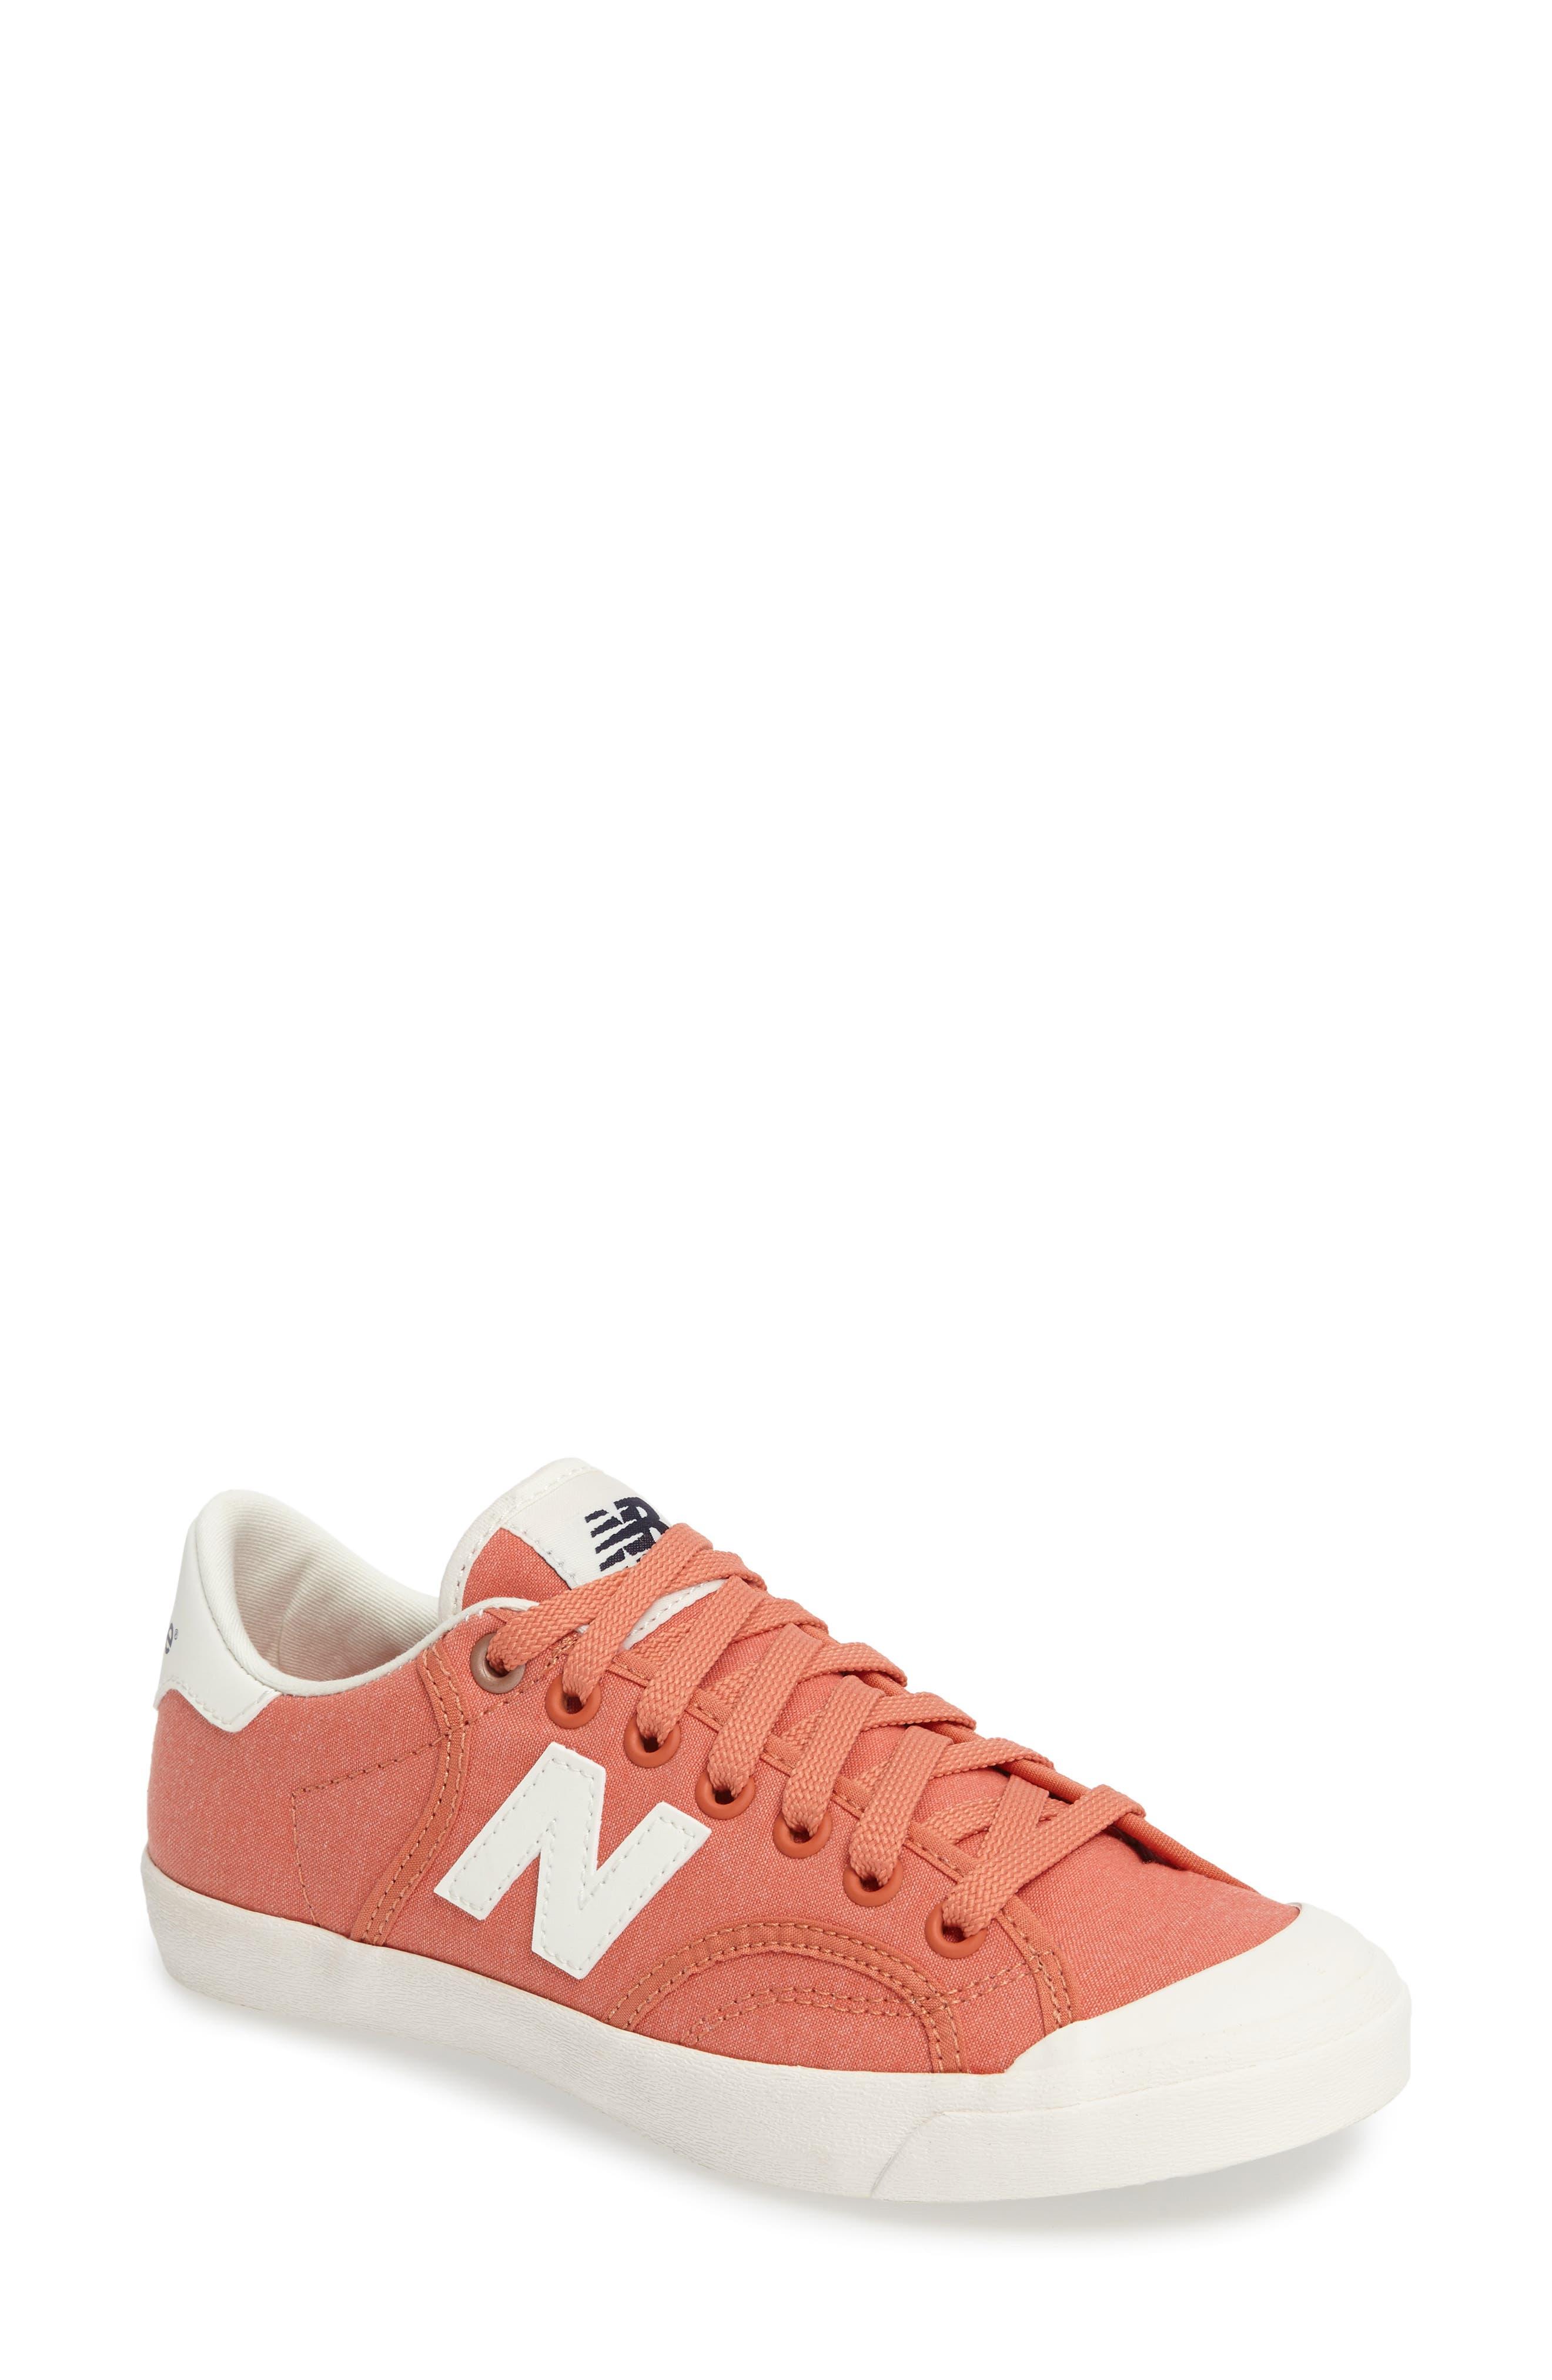 Main Image - New Balance Pro Court Sneaker (Women)